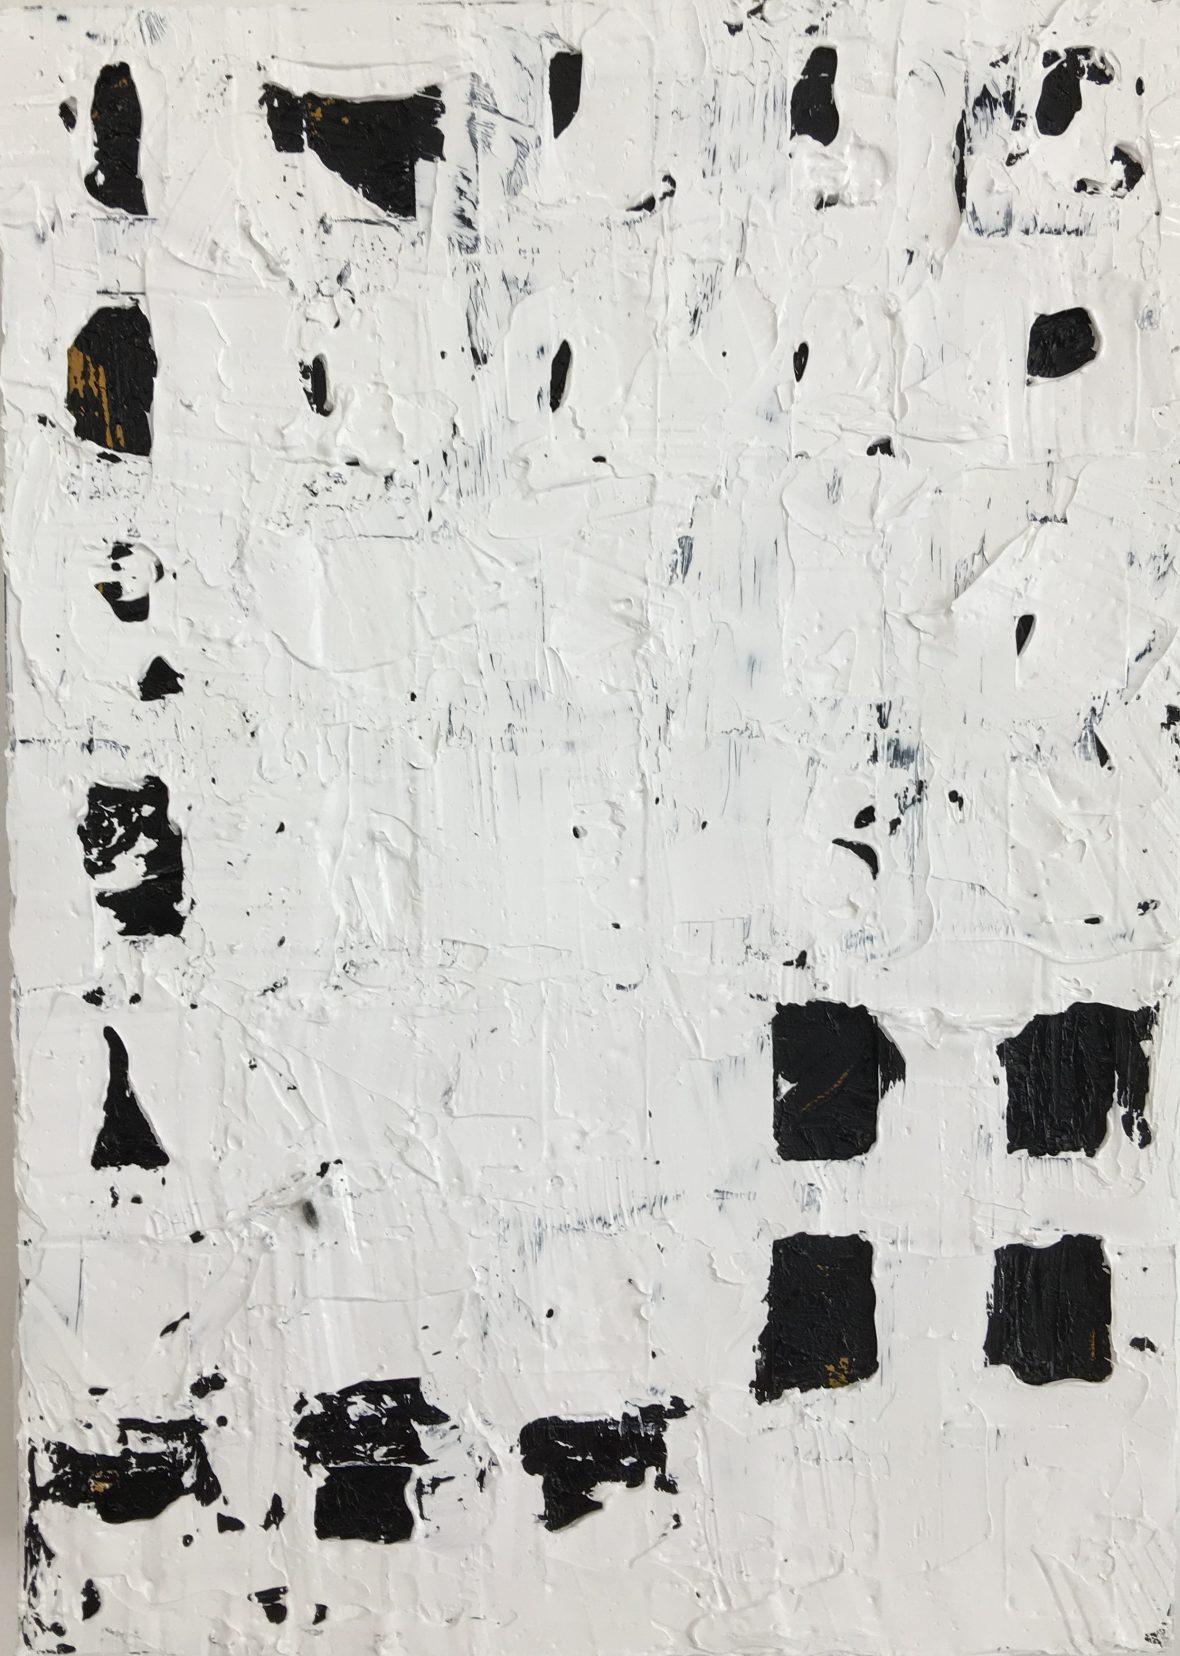 Mistä / Varifrån / From Where, oil on canvas and collage, 35 x 25 cm, 2018